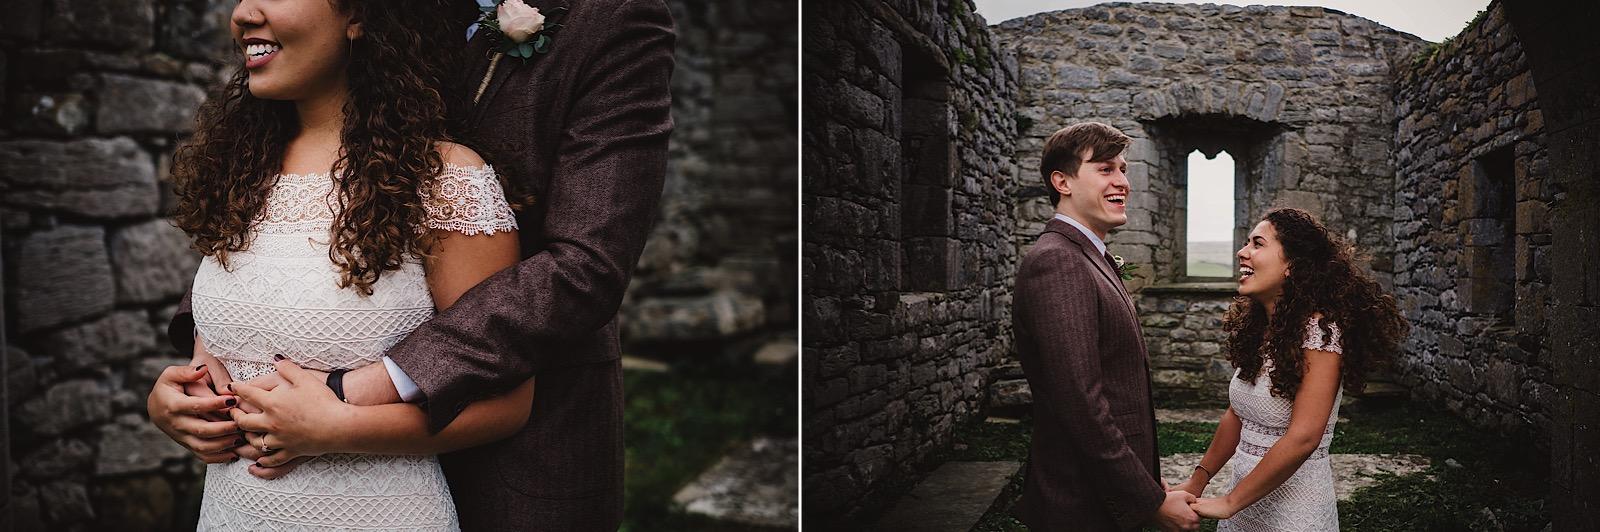 Elopement_Wedding_Ireland_Cliffs_of_moher0015